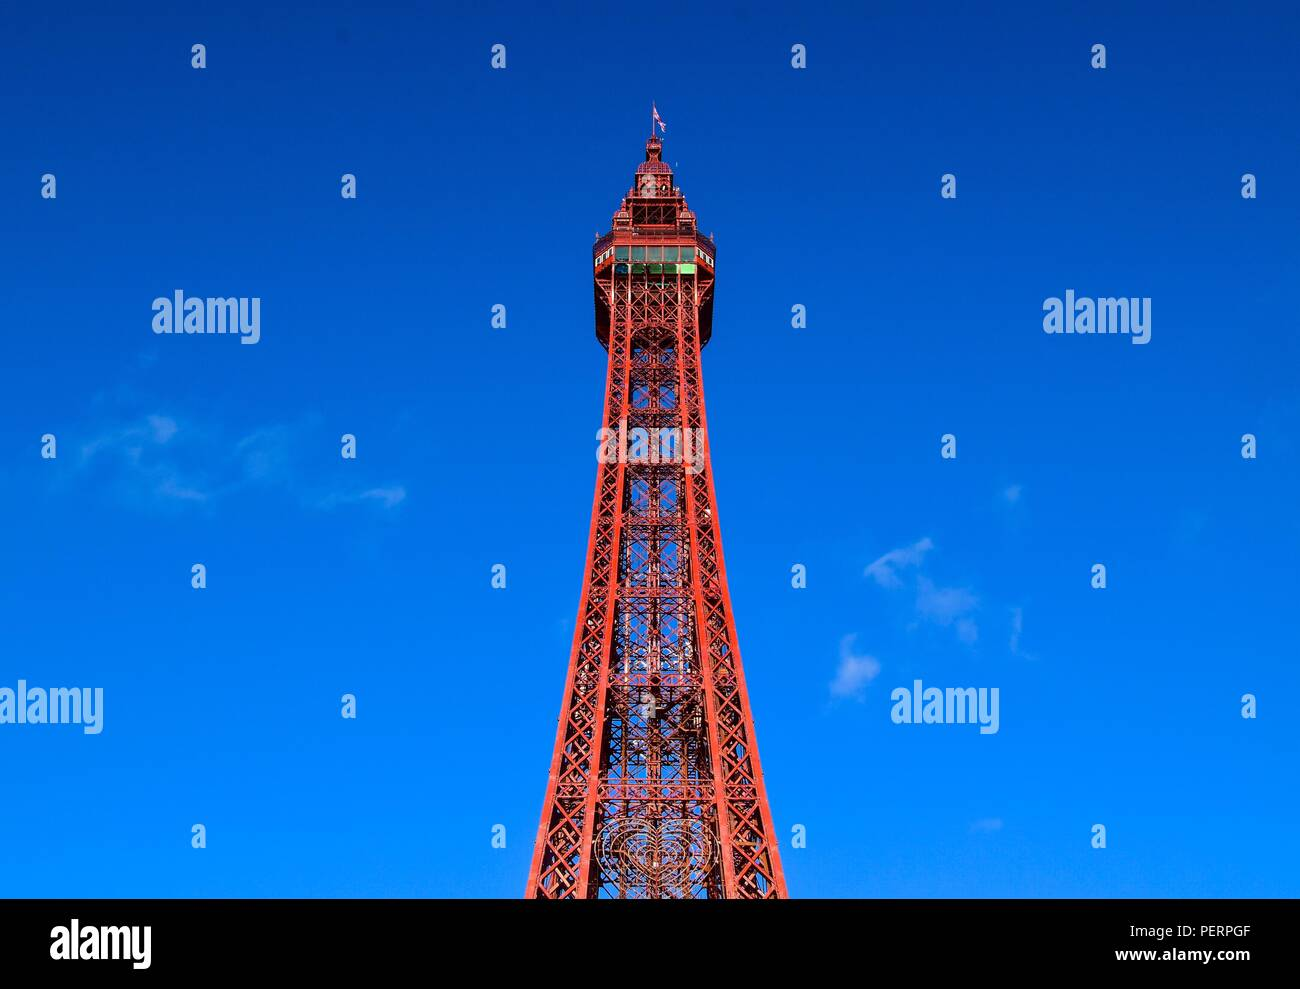 Blackpool Tower - Stock Image